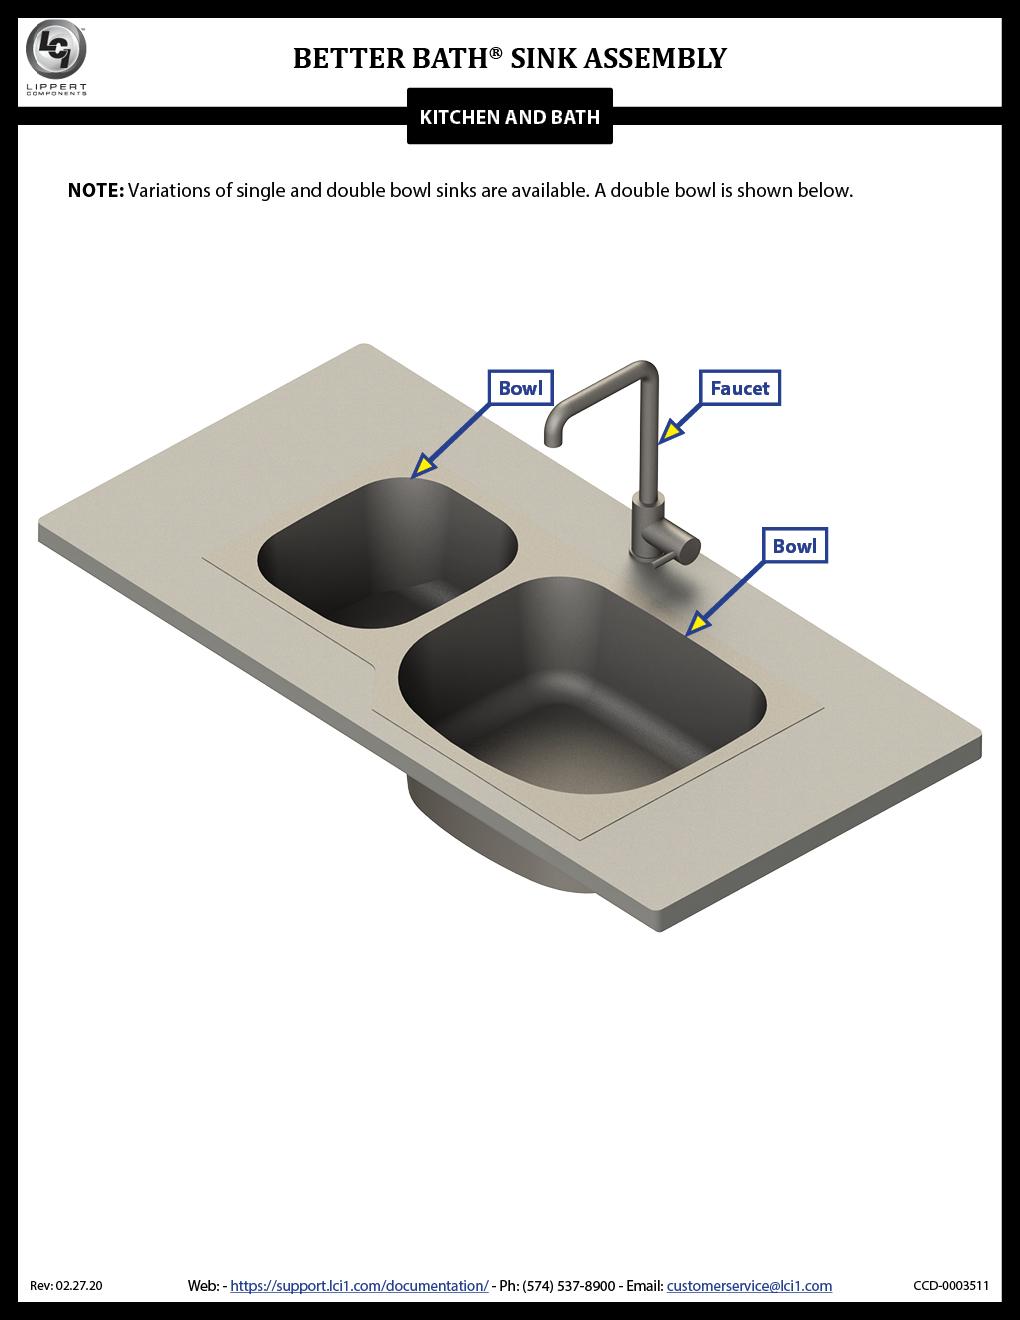 Better Bath® Sink Assembly